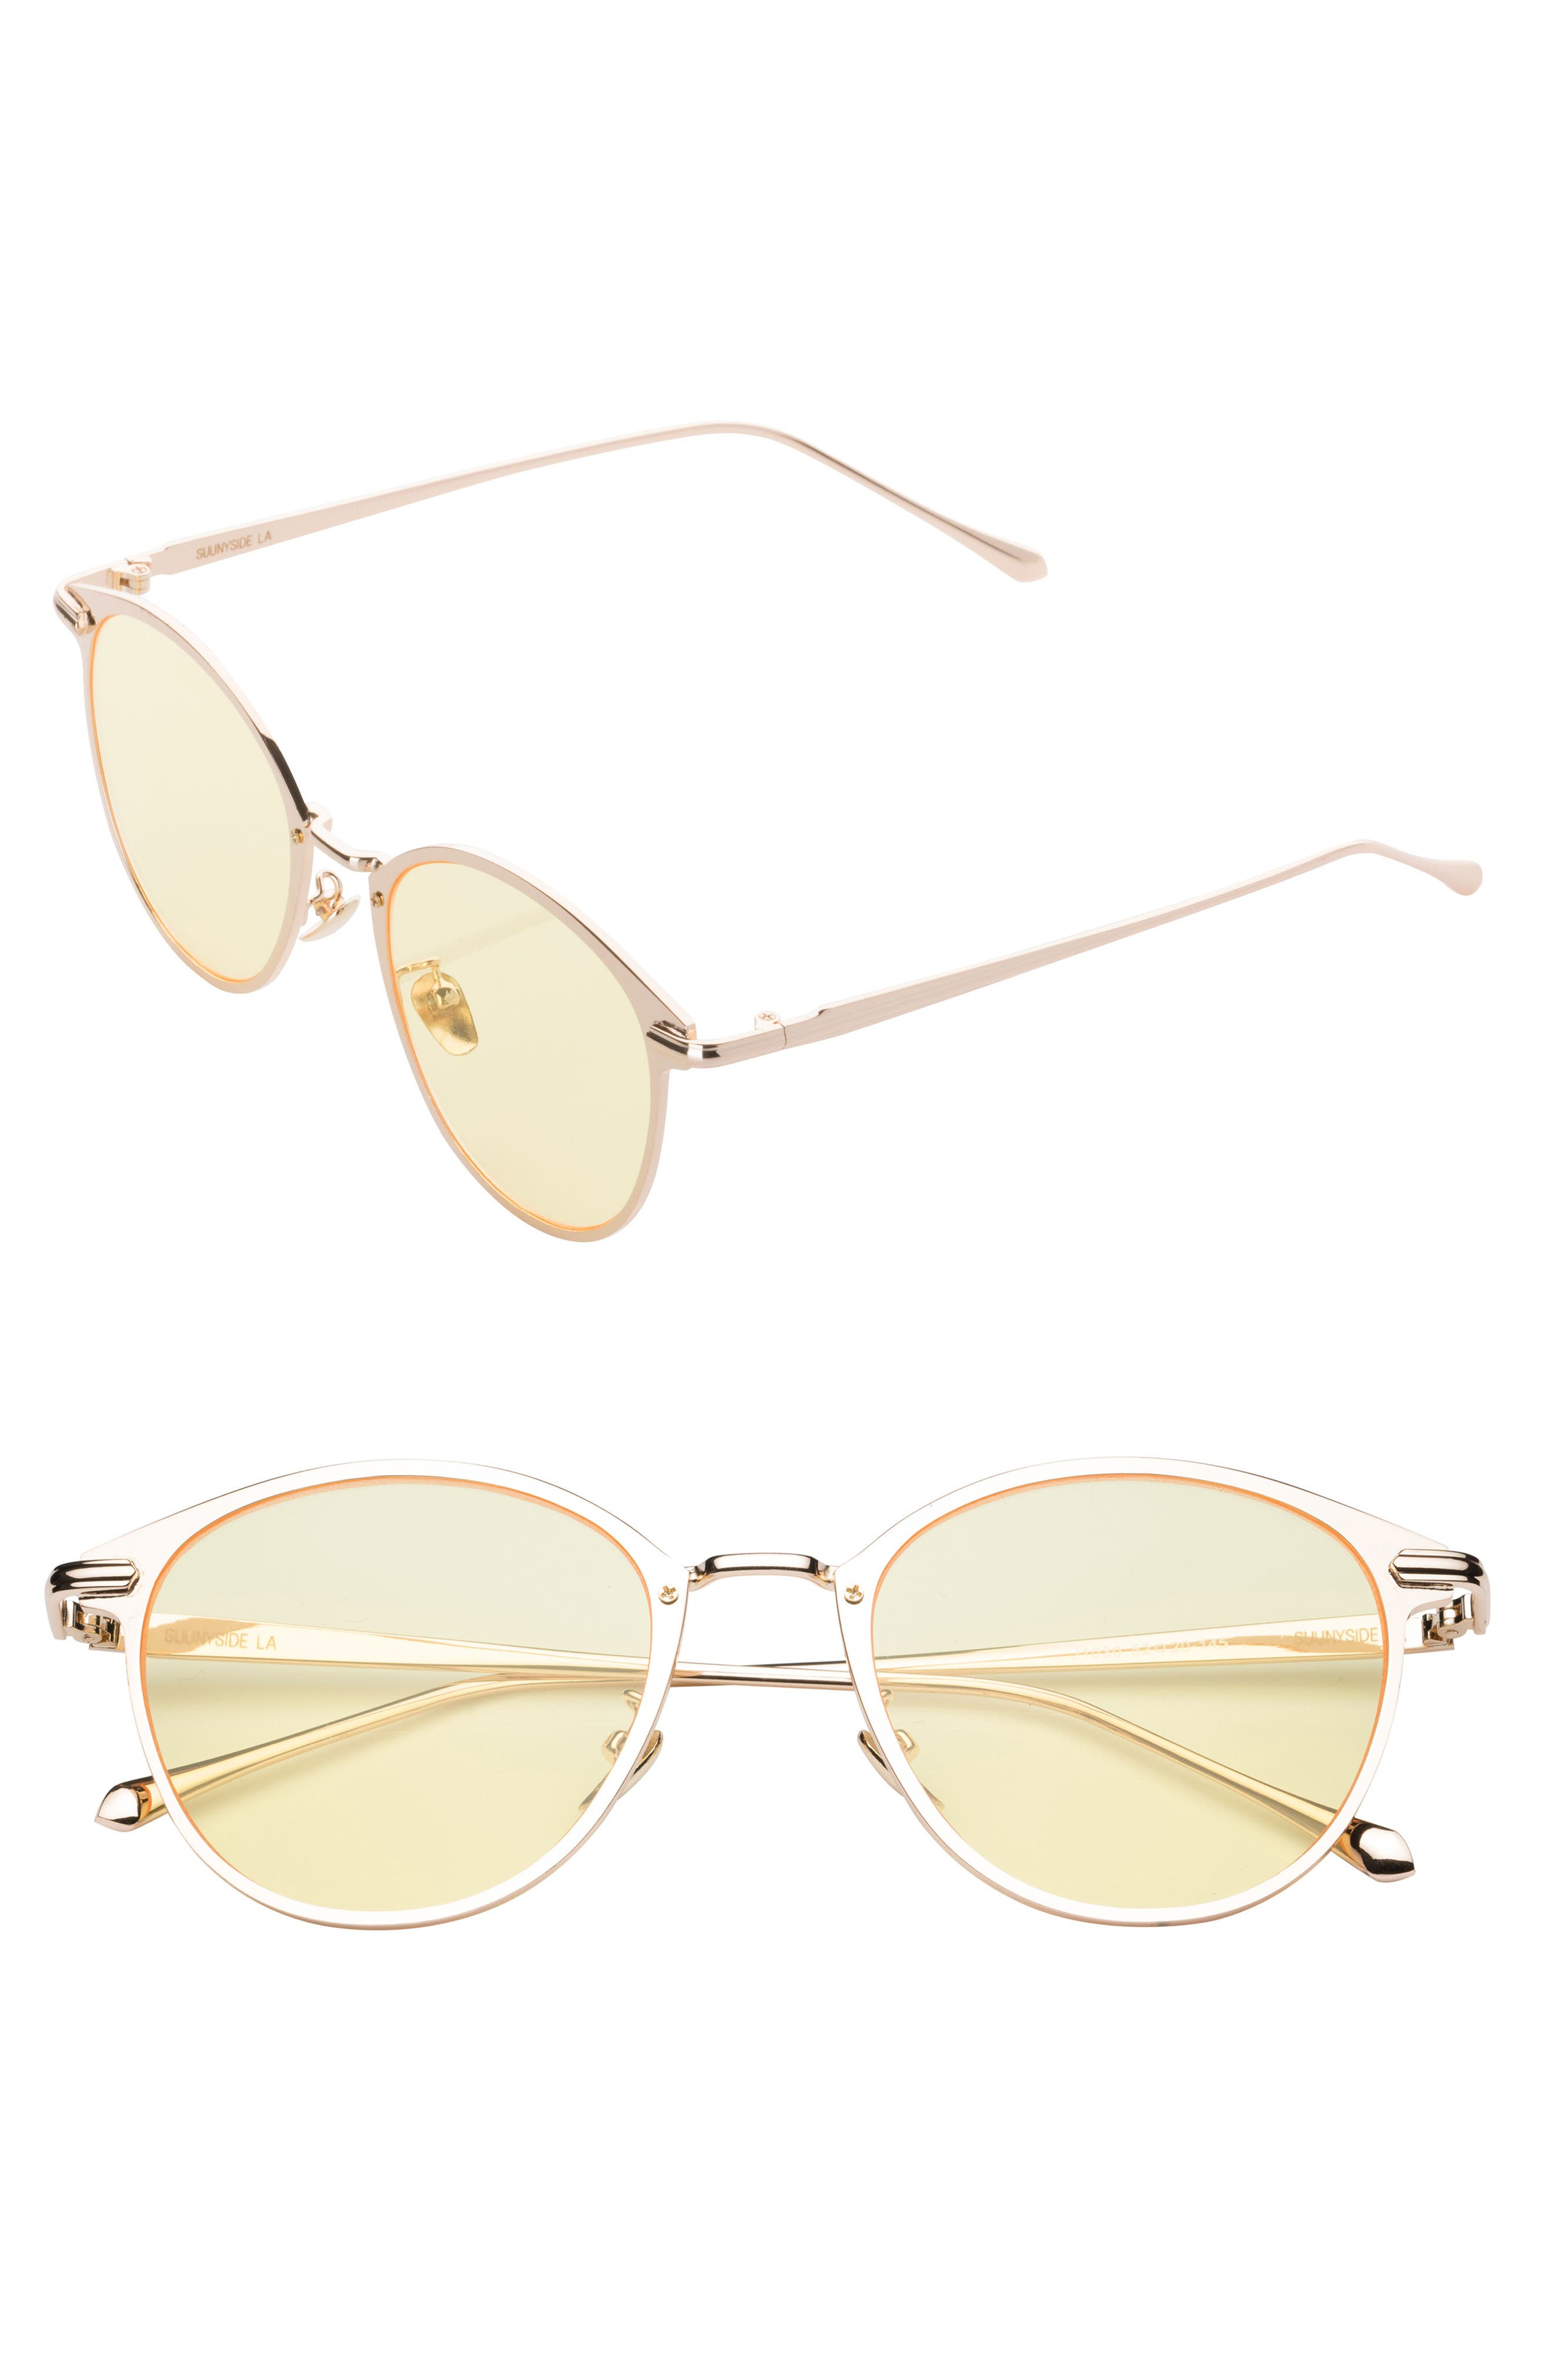 51mm Oxford Sunglasses,                             Main thumbnail 1, color,                             Yellow/ Gold